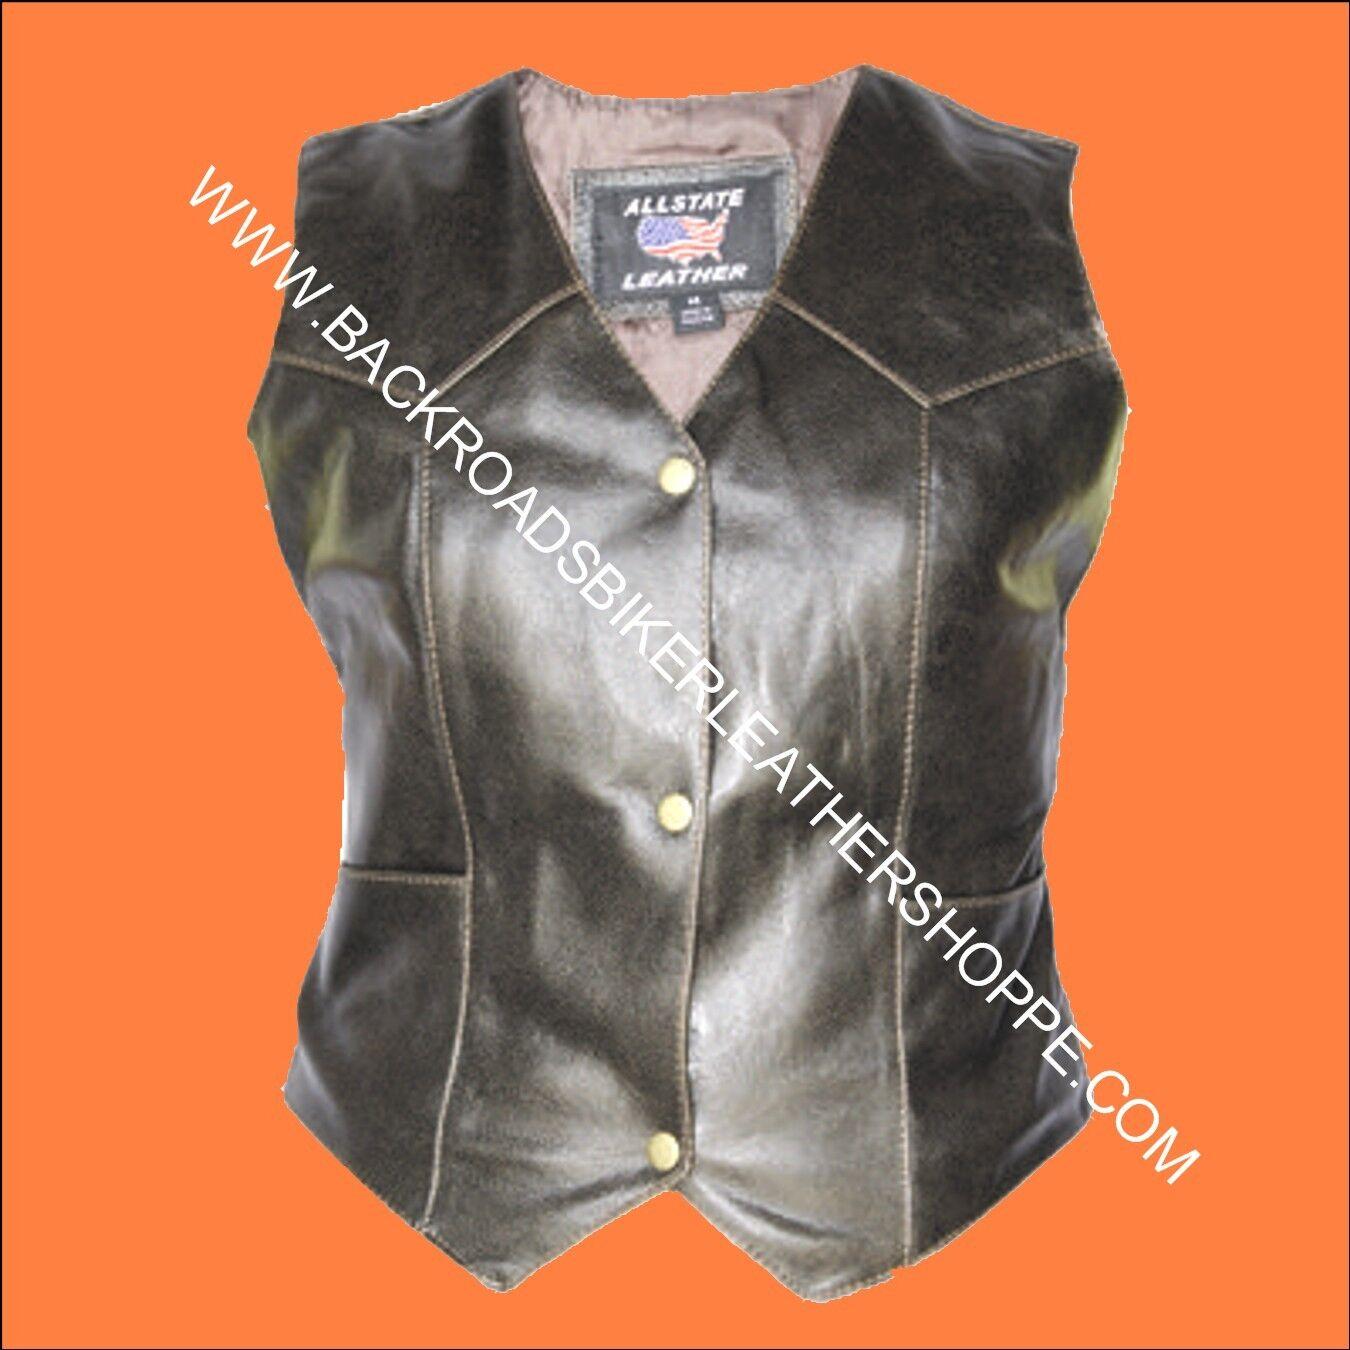 Ladies Womens Retro Brown Leather Vest Motorcycle Biker - Sizes XS to 5X